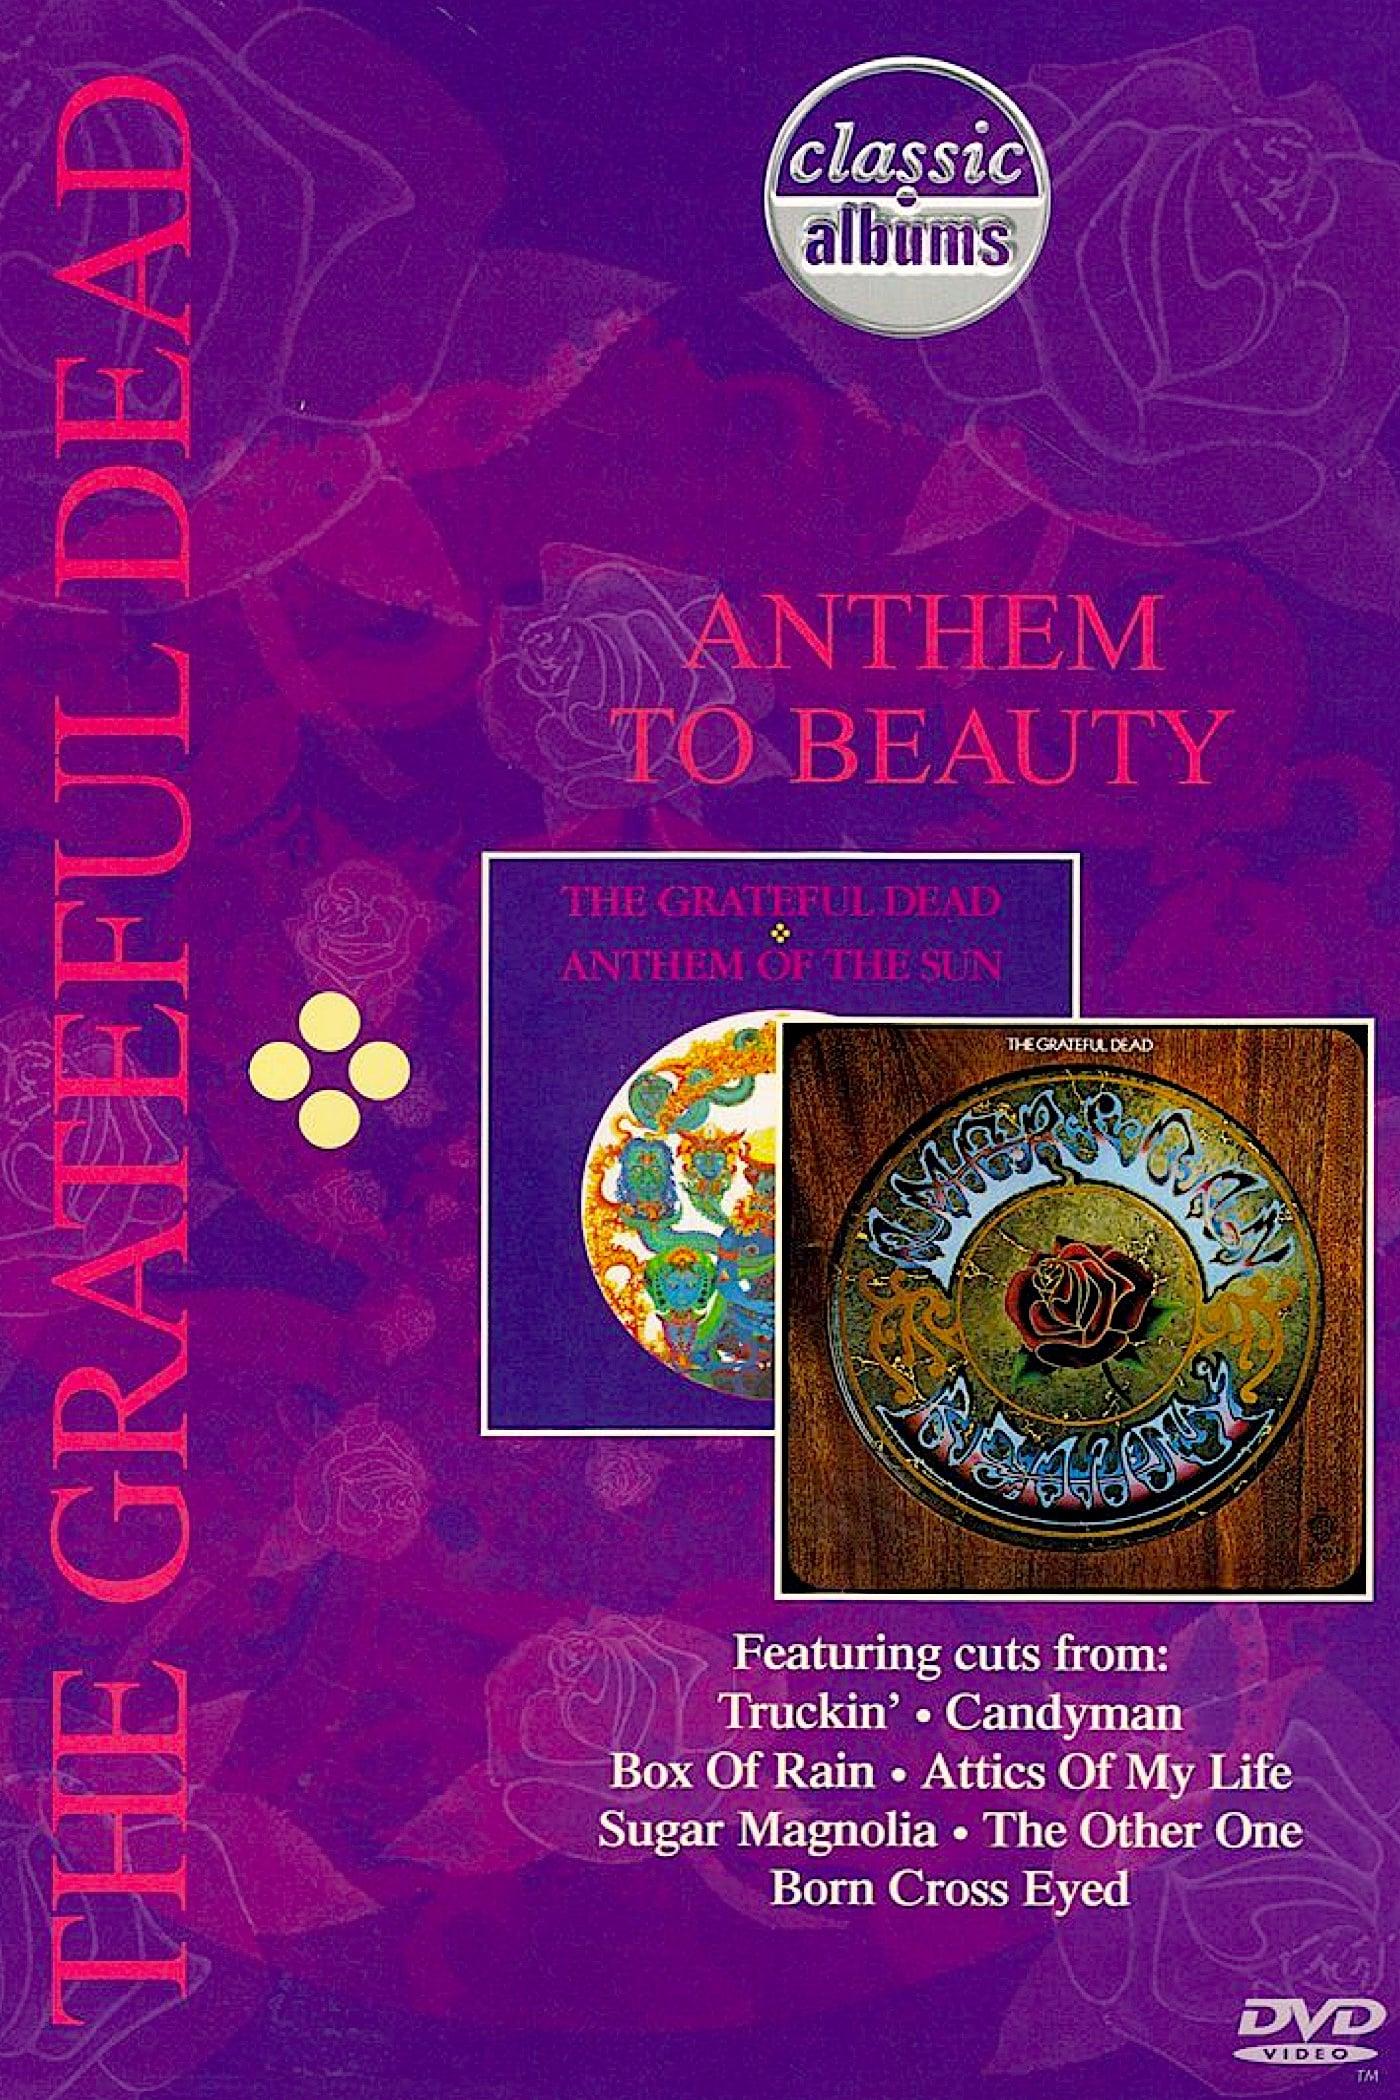 Grateful Dead: Anthem to Beauty (1997)